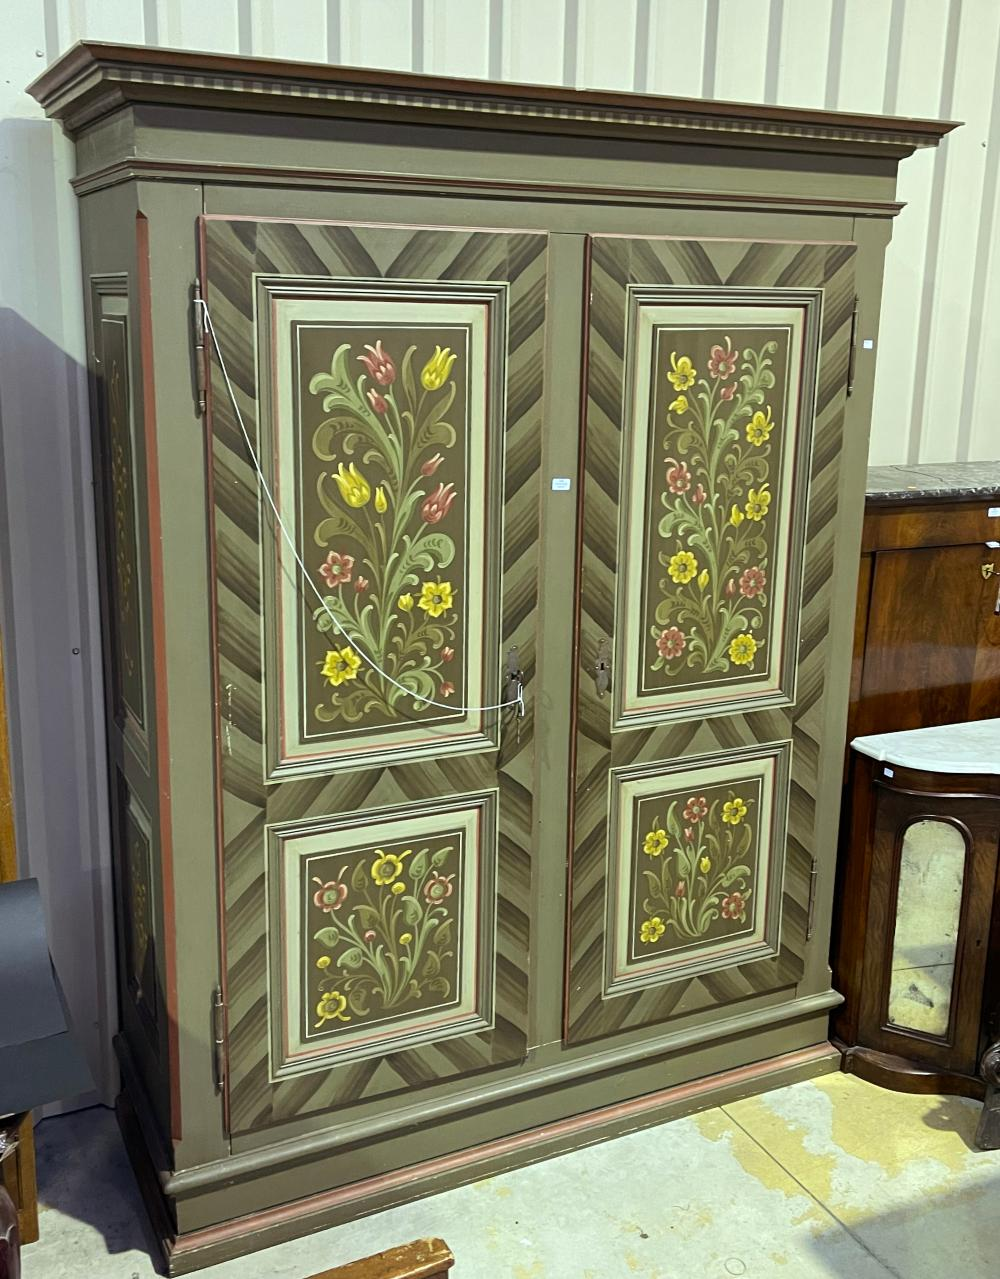 Large antique Swiss painted two door armoire, approx 223cm H x 178cm W x 63cm D